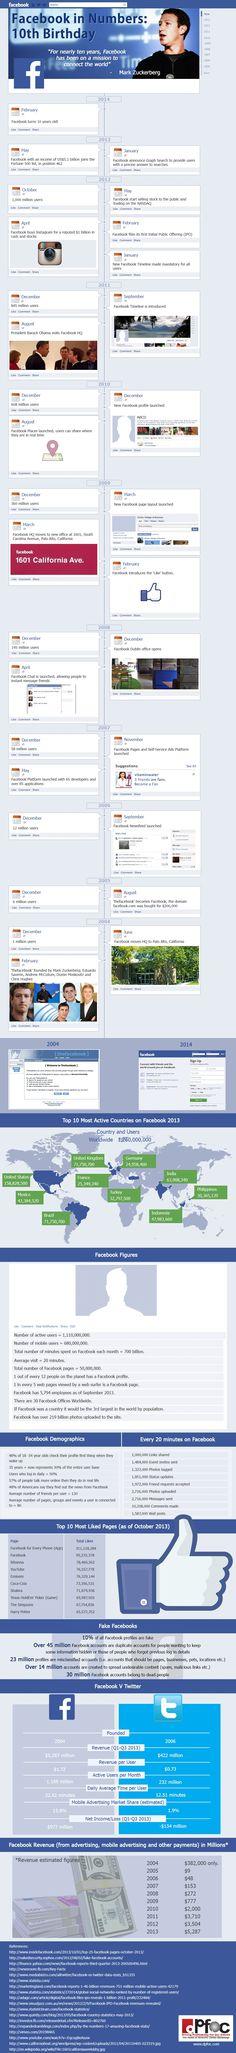 Happy Birthday Facebook: #infographic Facebook in Numbers